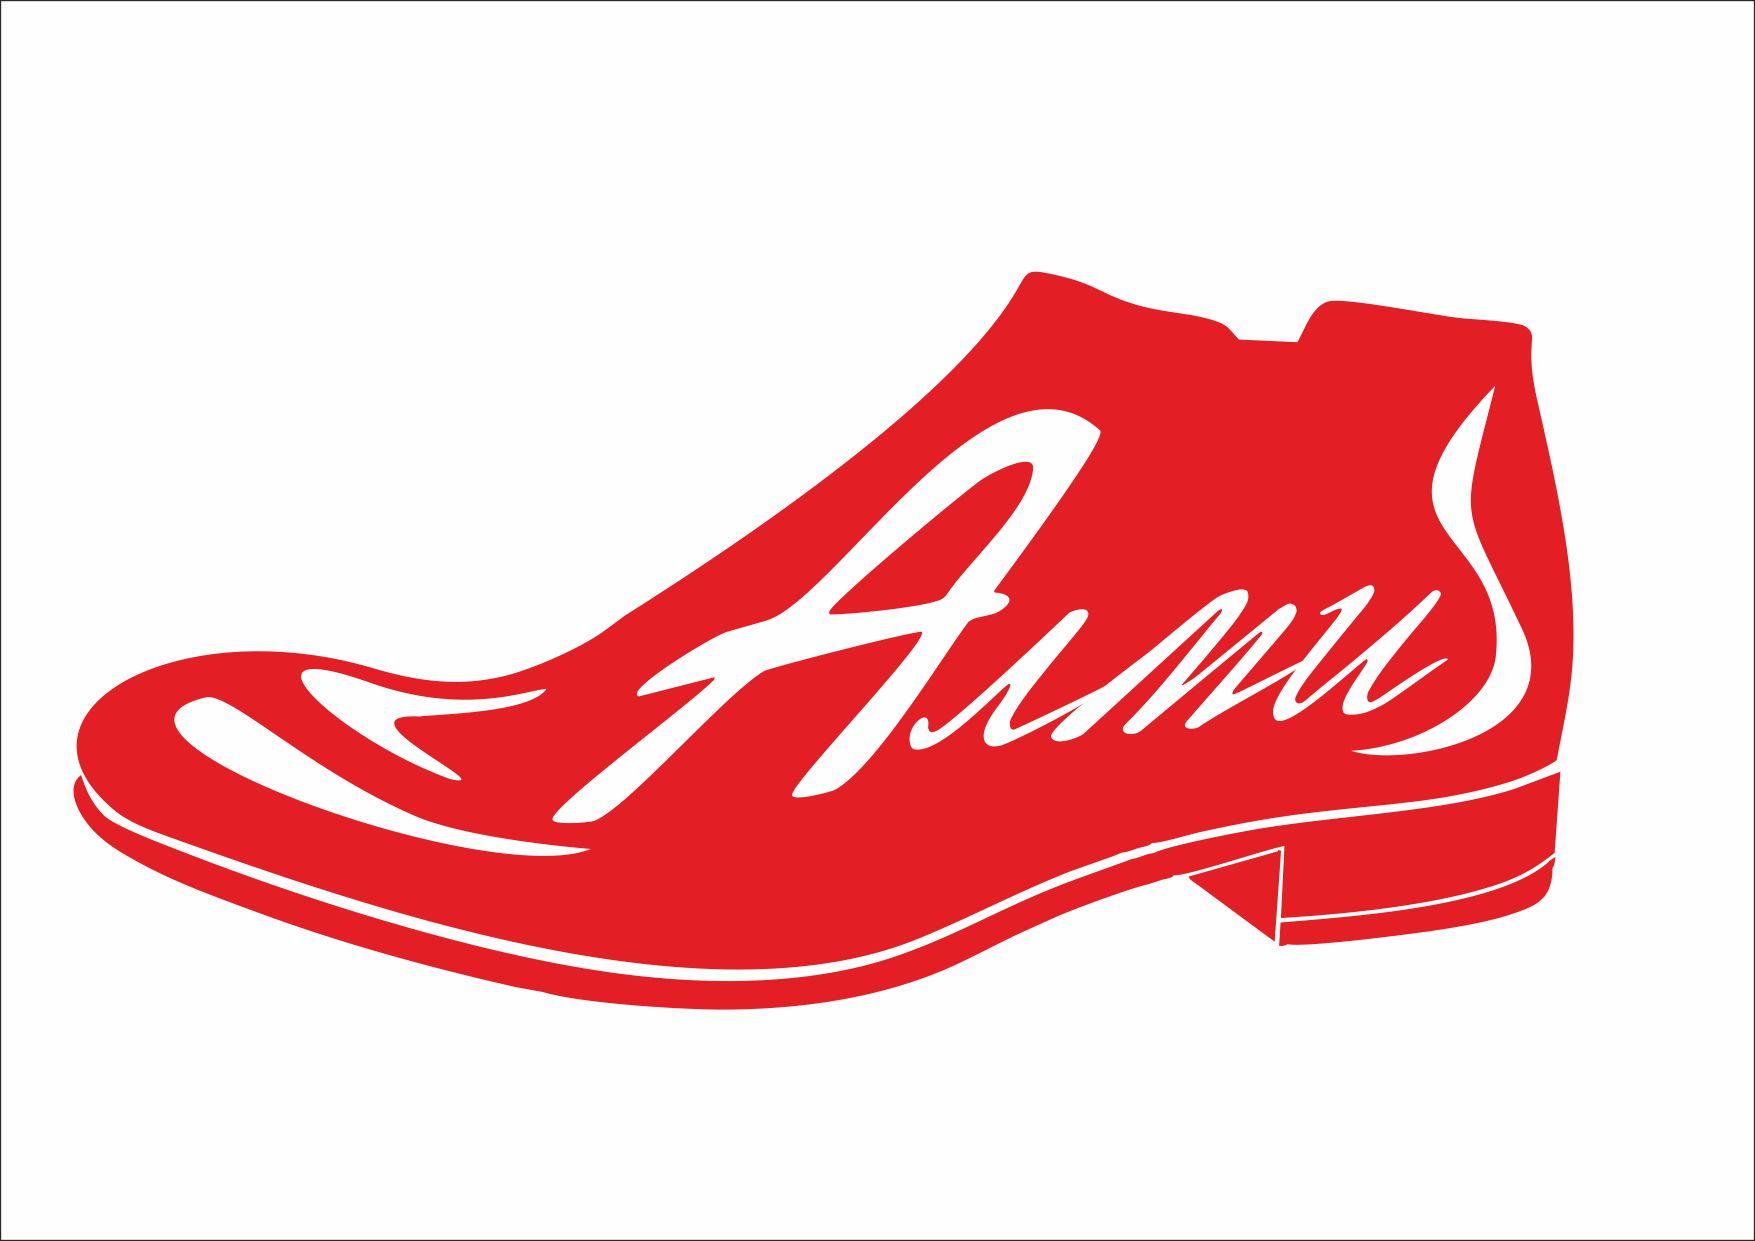 Дизайн логотипа обувной марки Алми фото f_19059d98219eda63.jpg